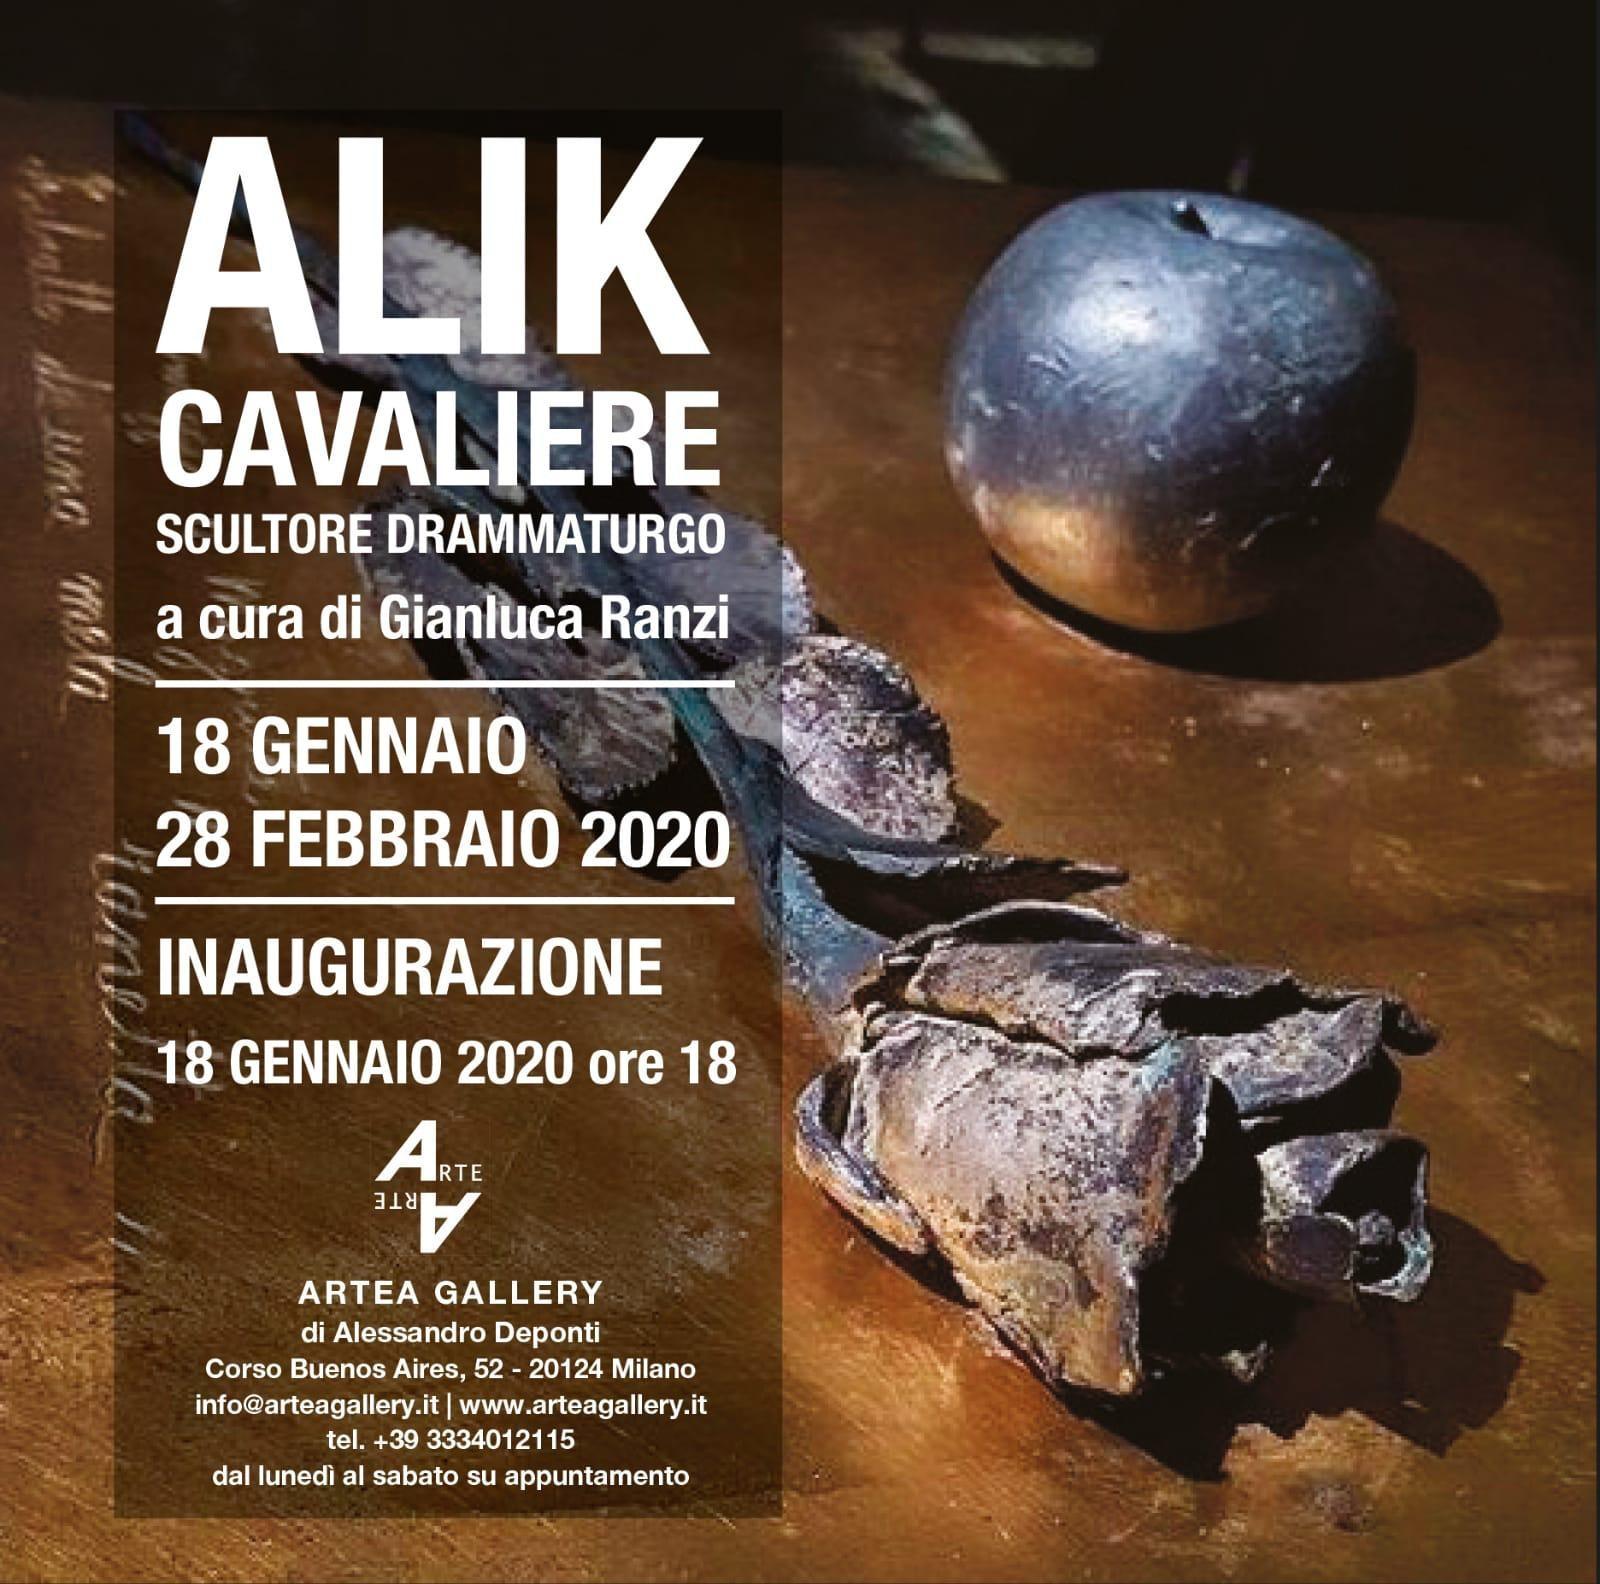 Alik Cavaliere - Scultore drammaturgo